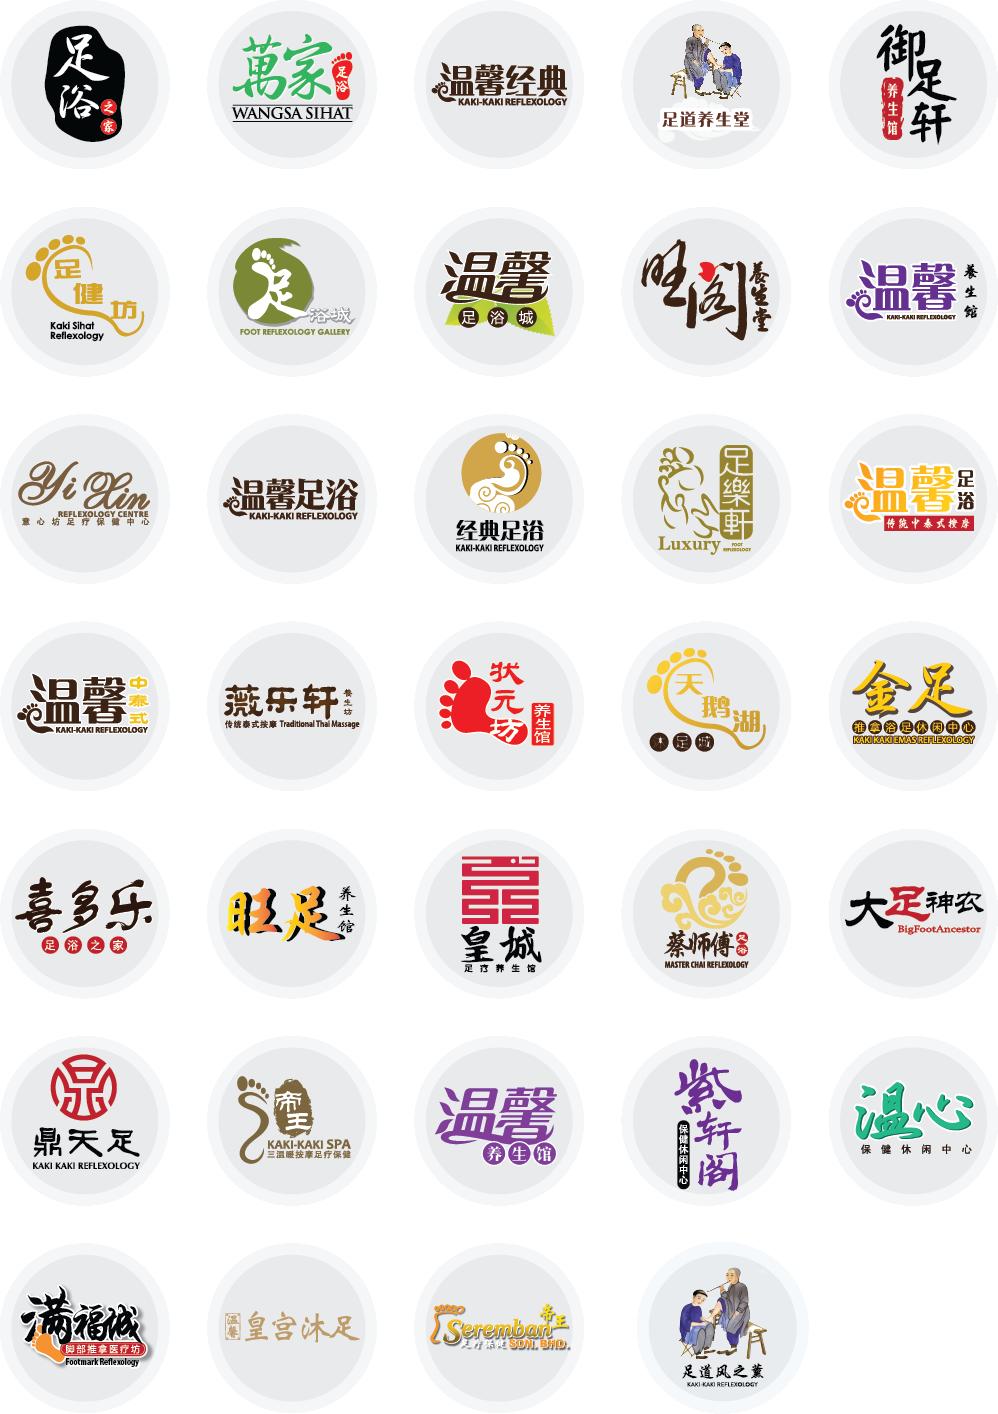 Kaki-Kaki Group 温馨集团- The Biggest Reflexology Company In